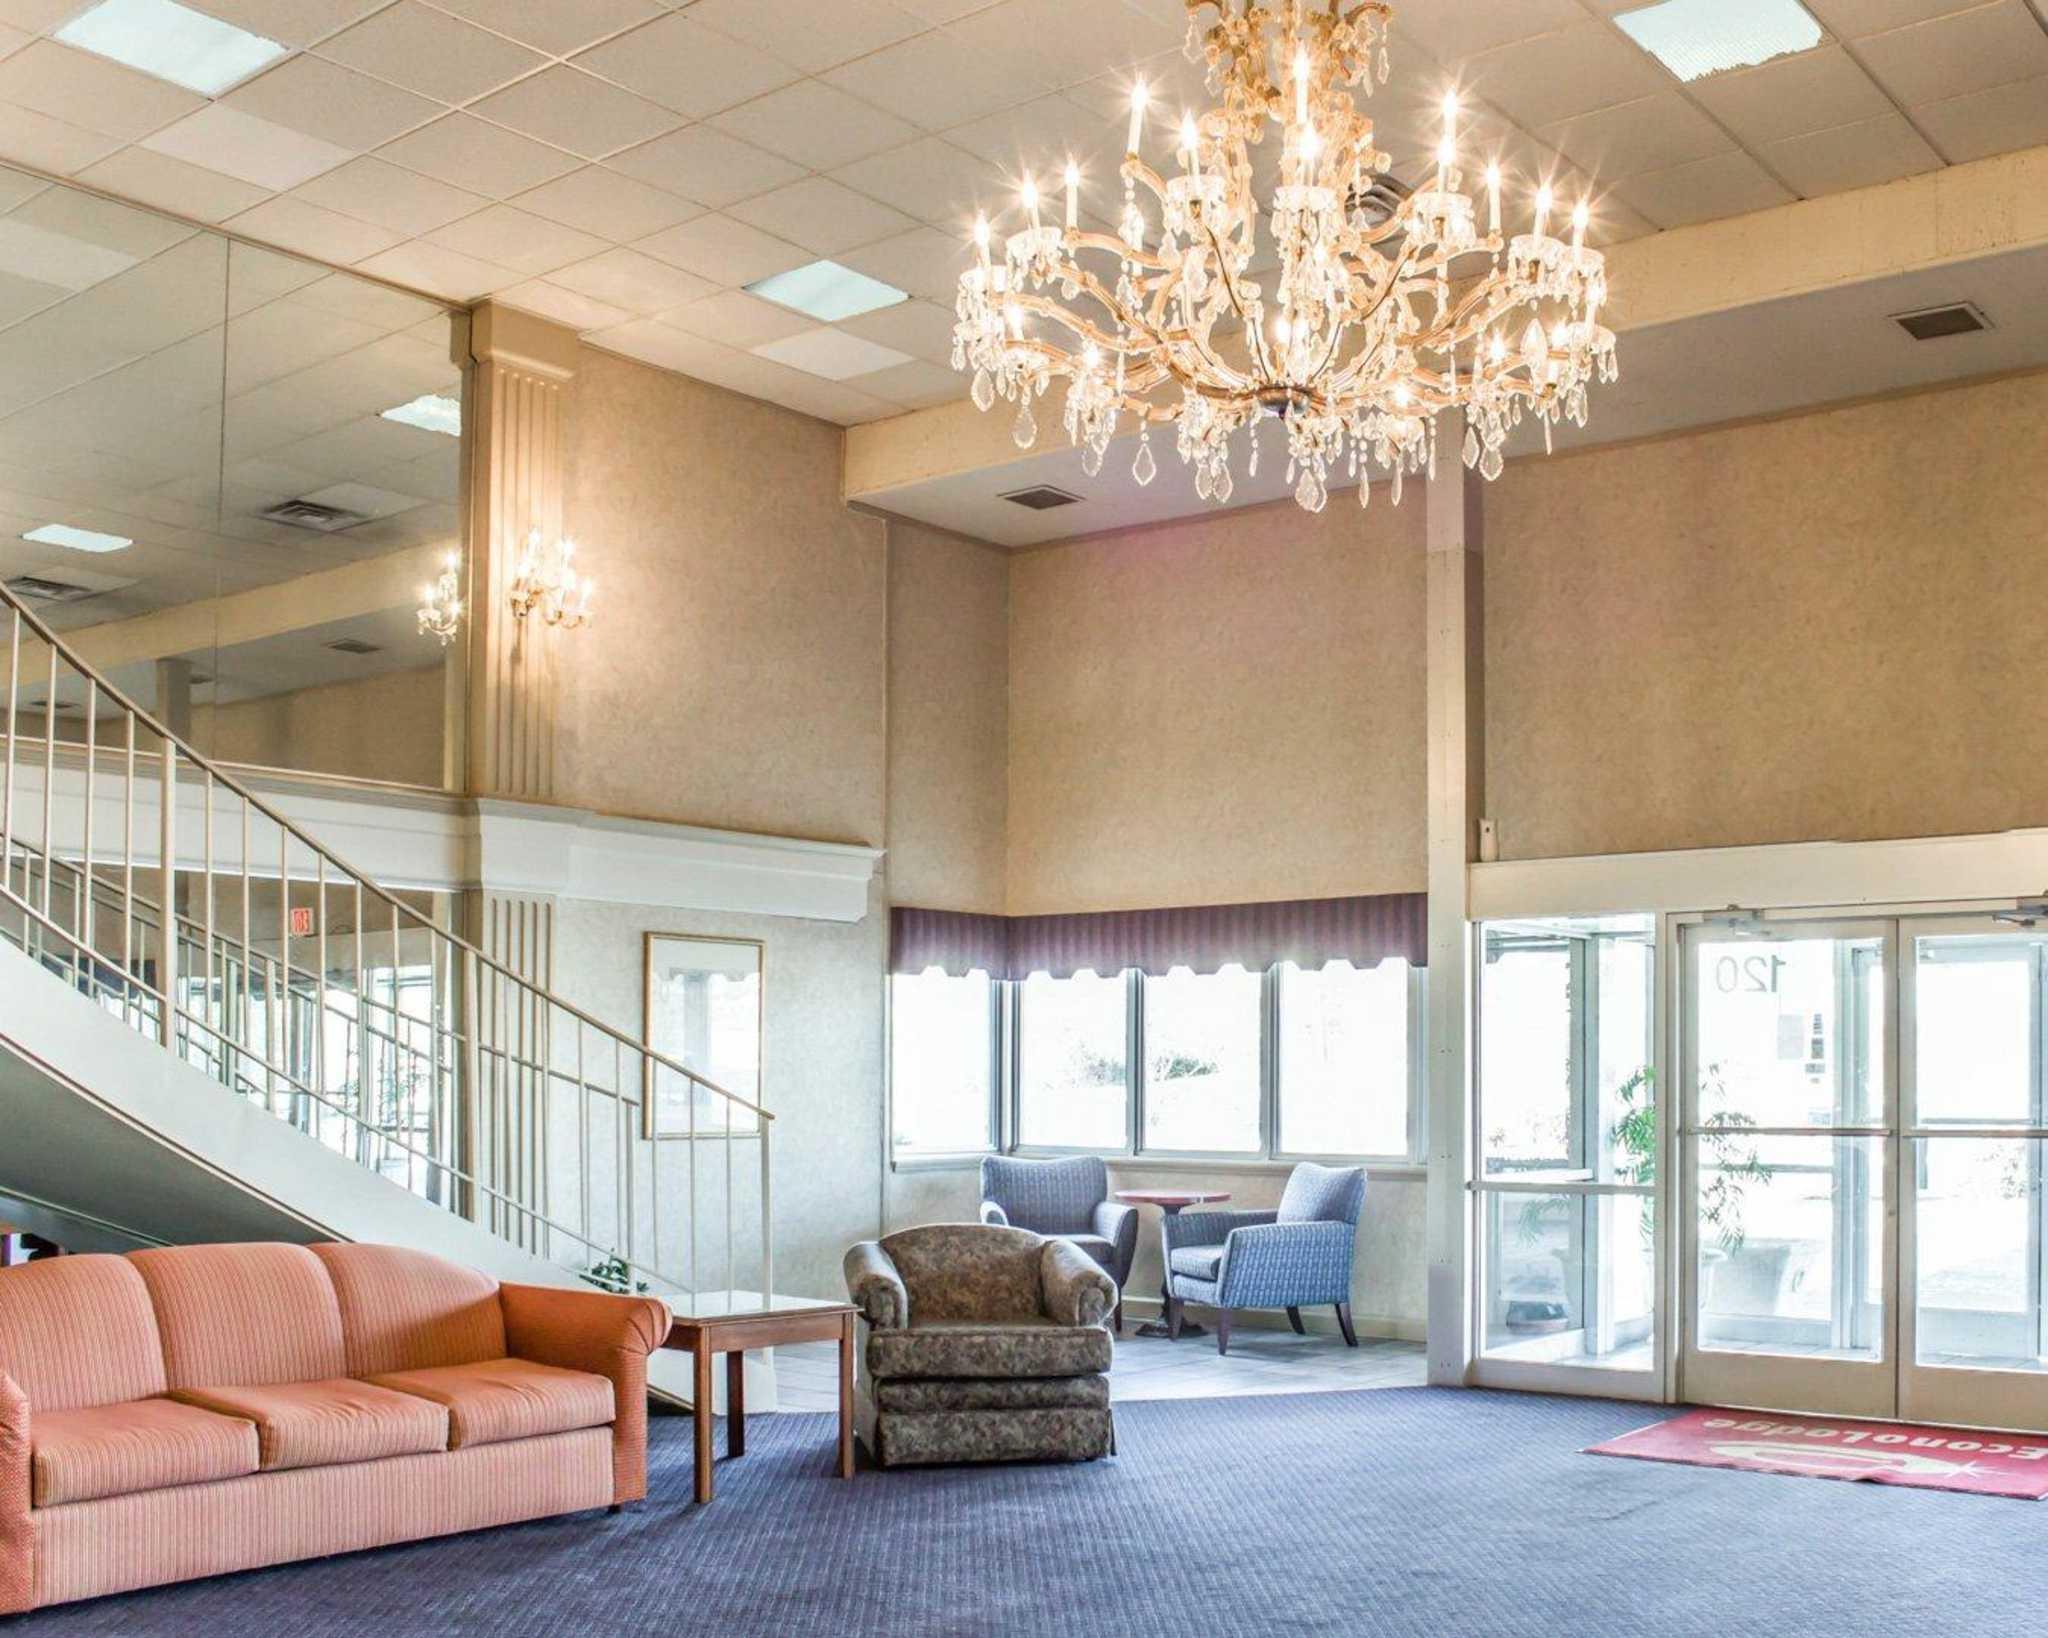 Econo Lodge & Suites image 17